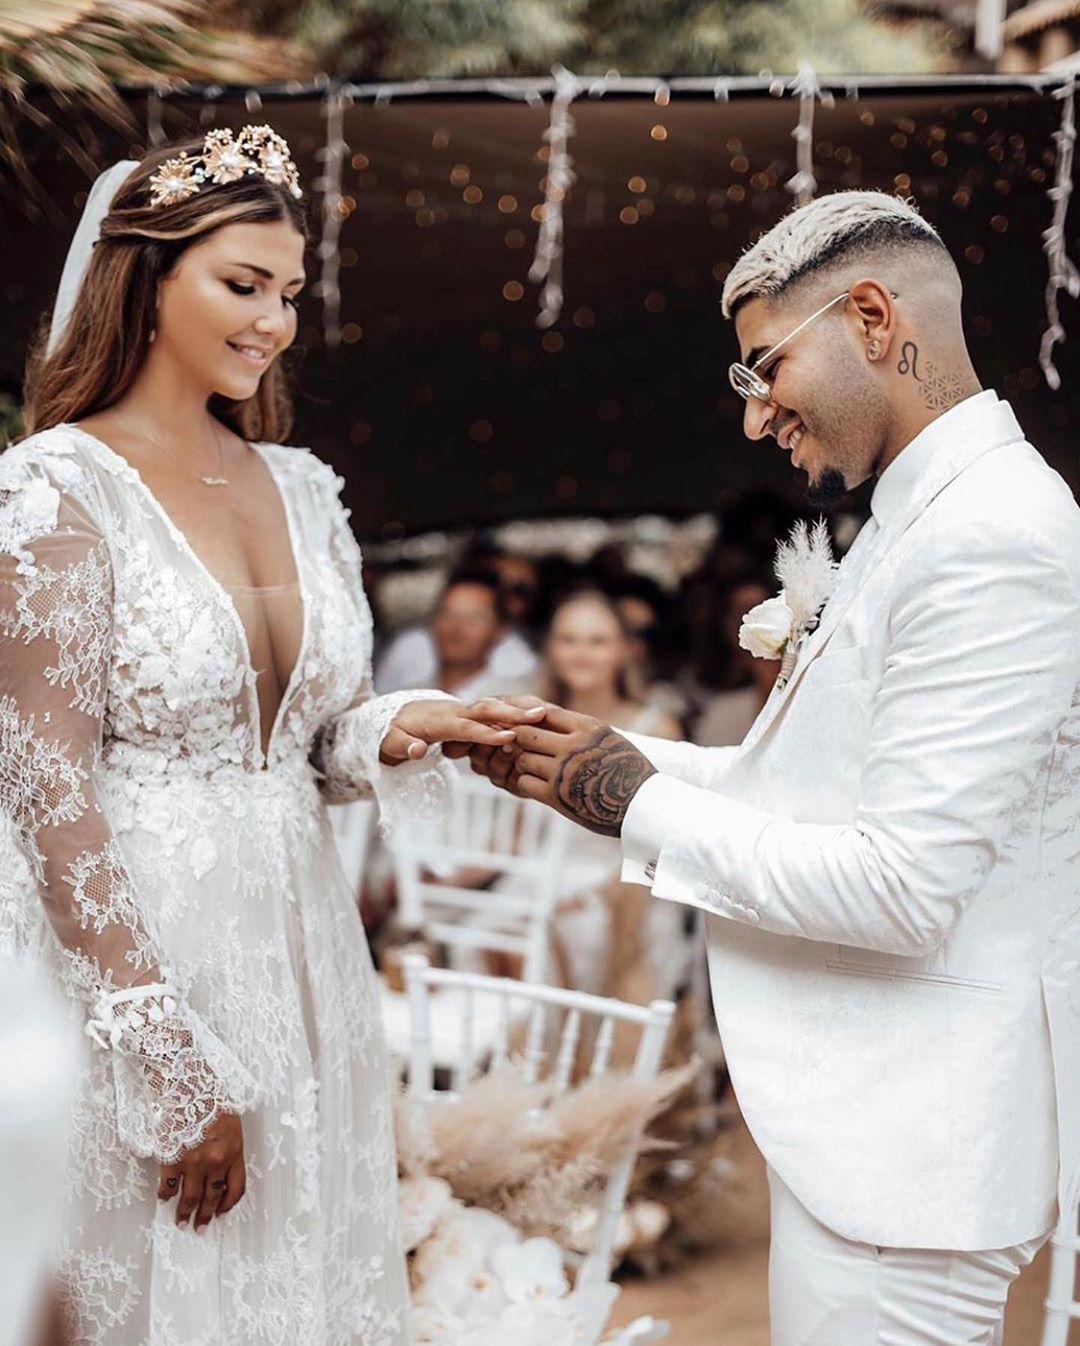 A bertabride wedding of dreams stunning novalanalove